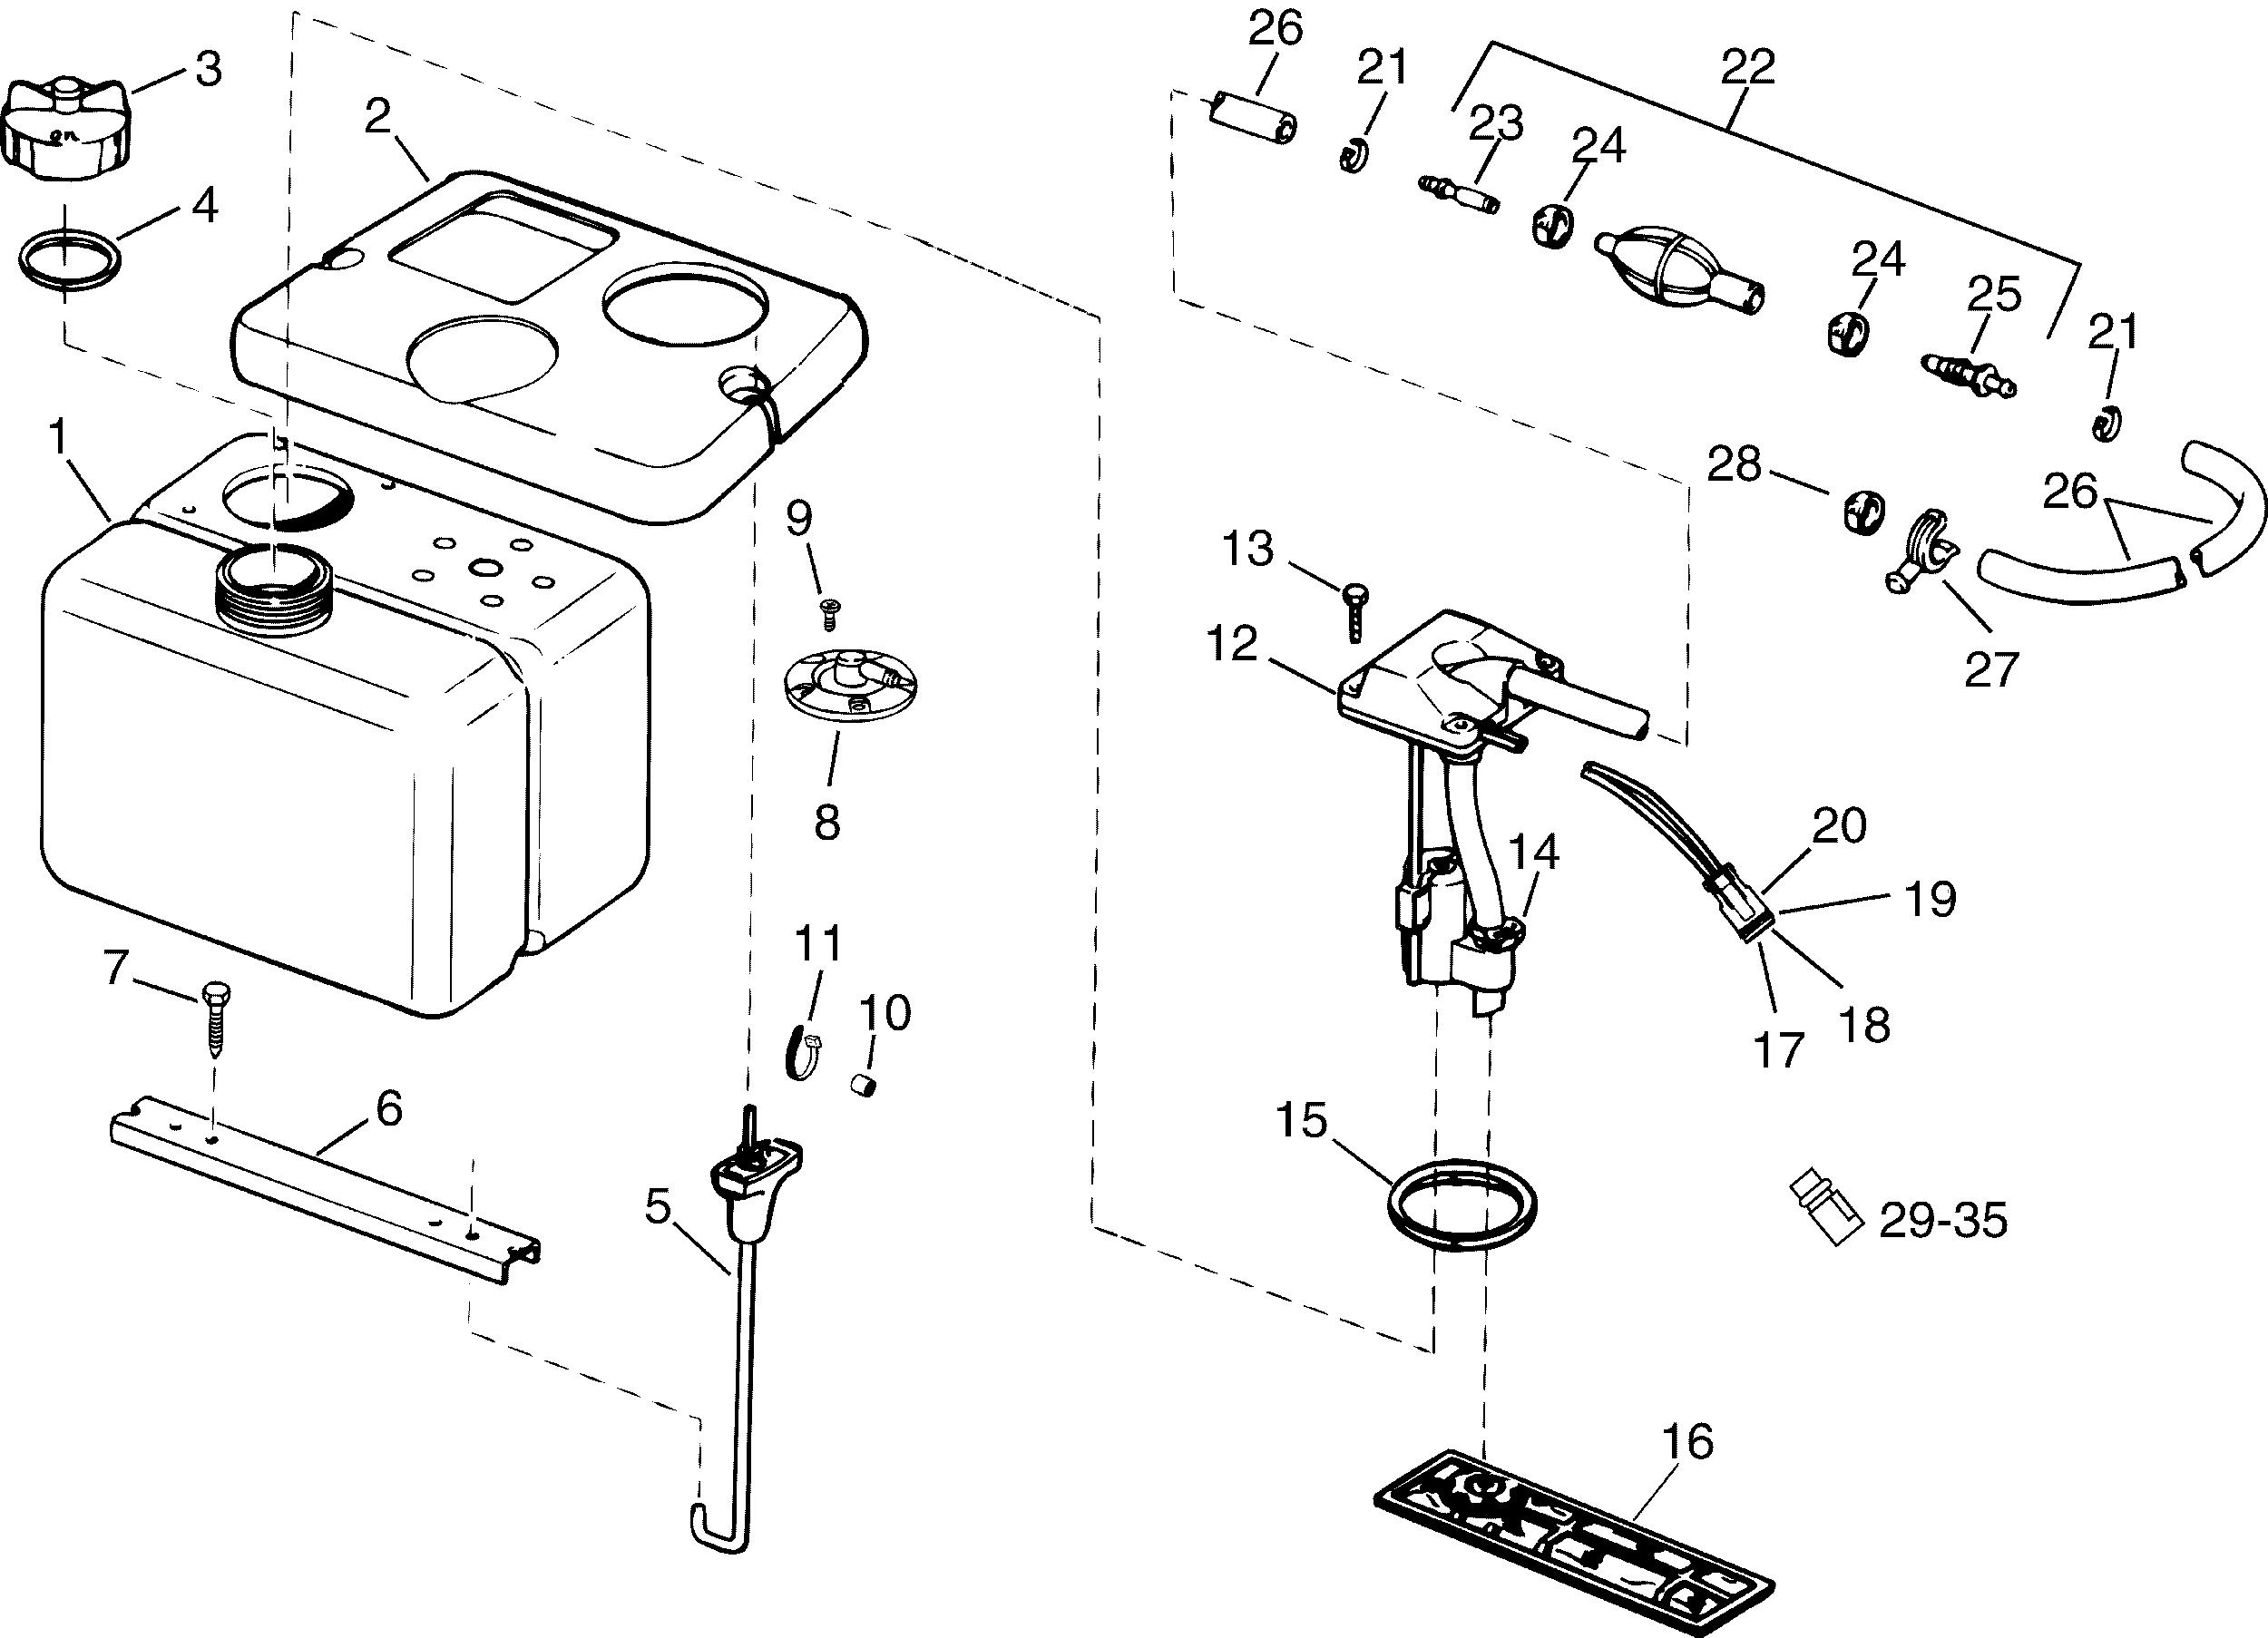 Evinrude Engine Oil